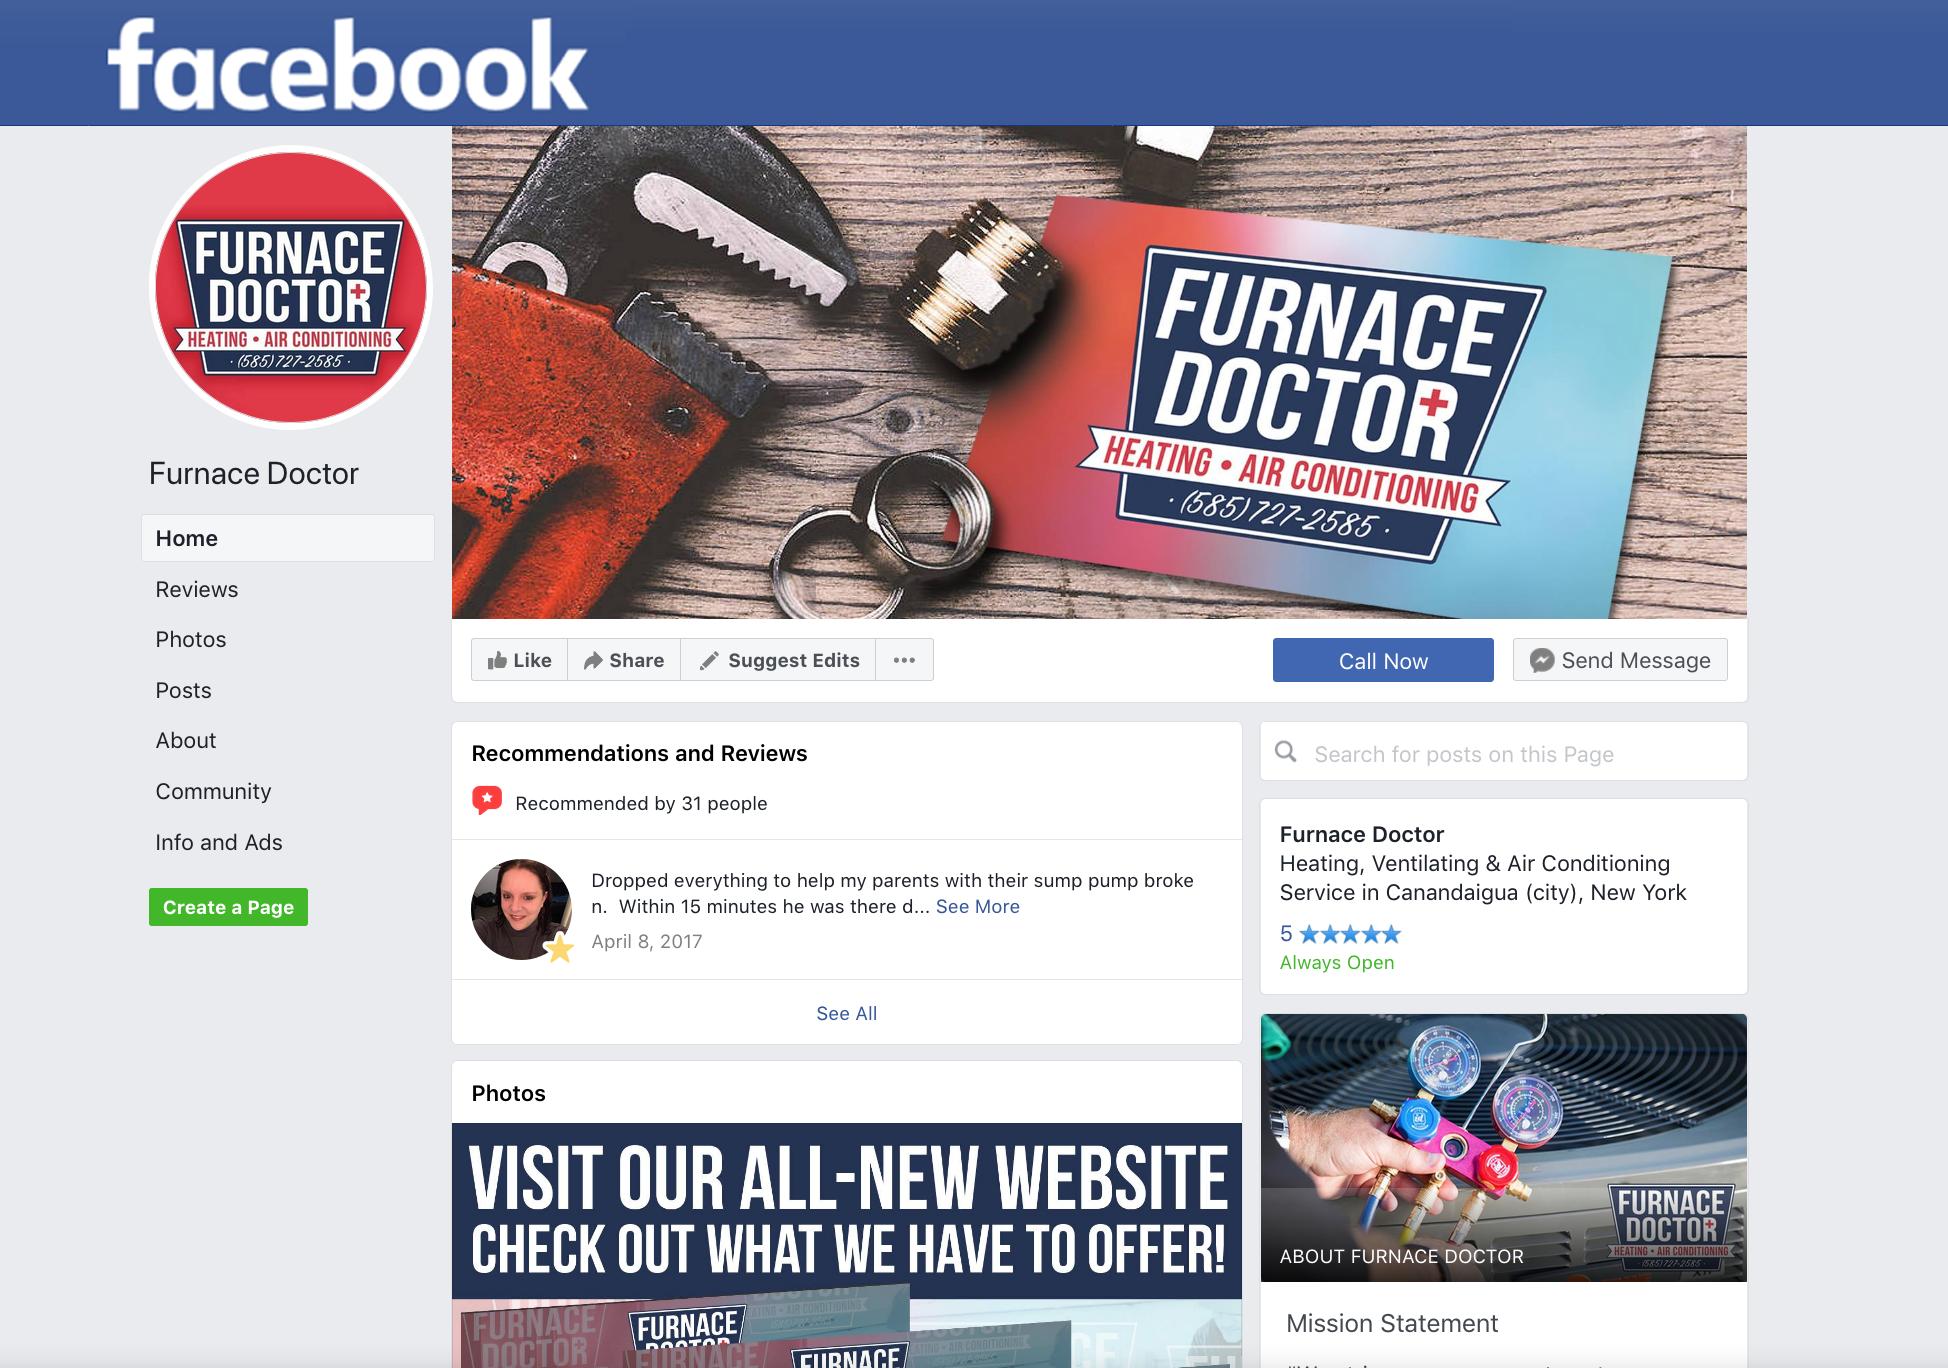 Furnace Doctor Facebook